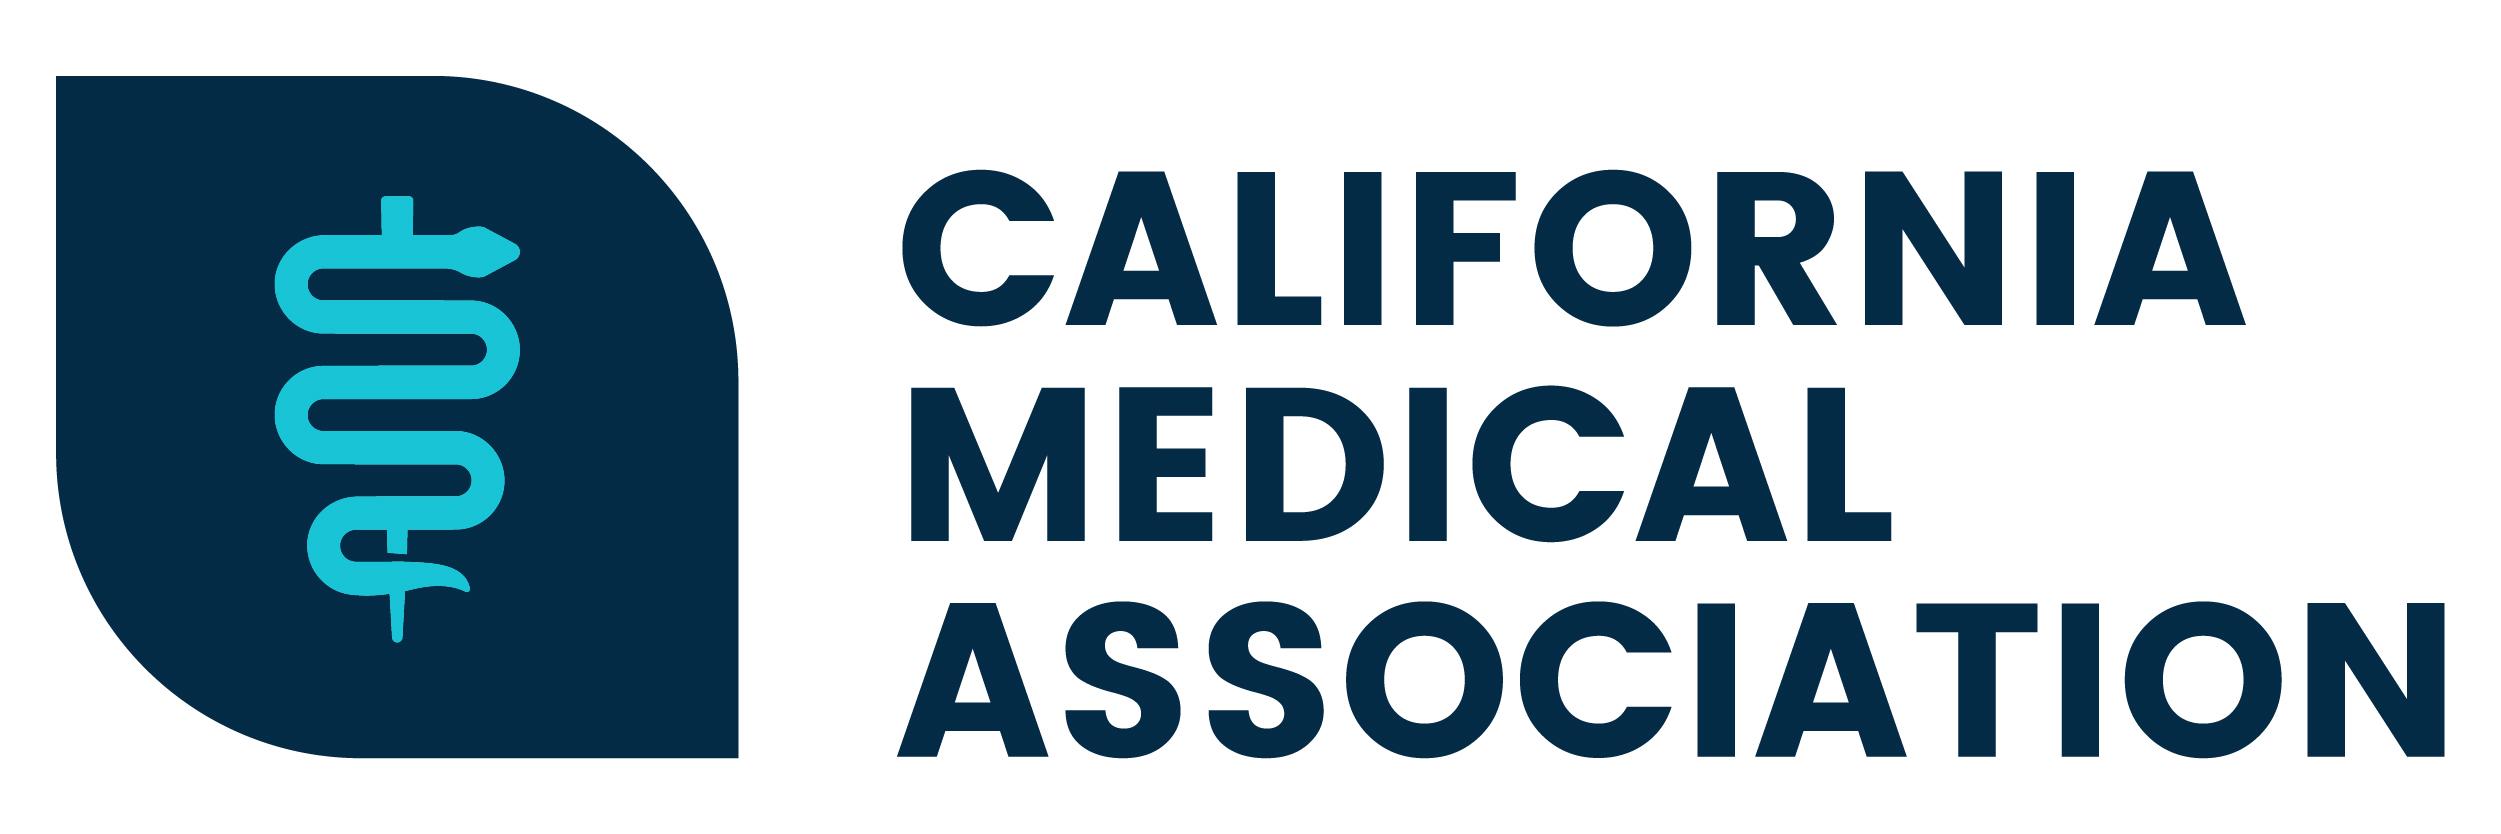 California Medical Association company logo